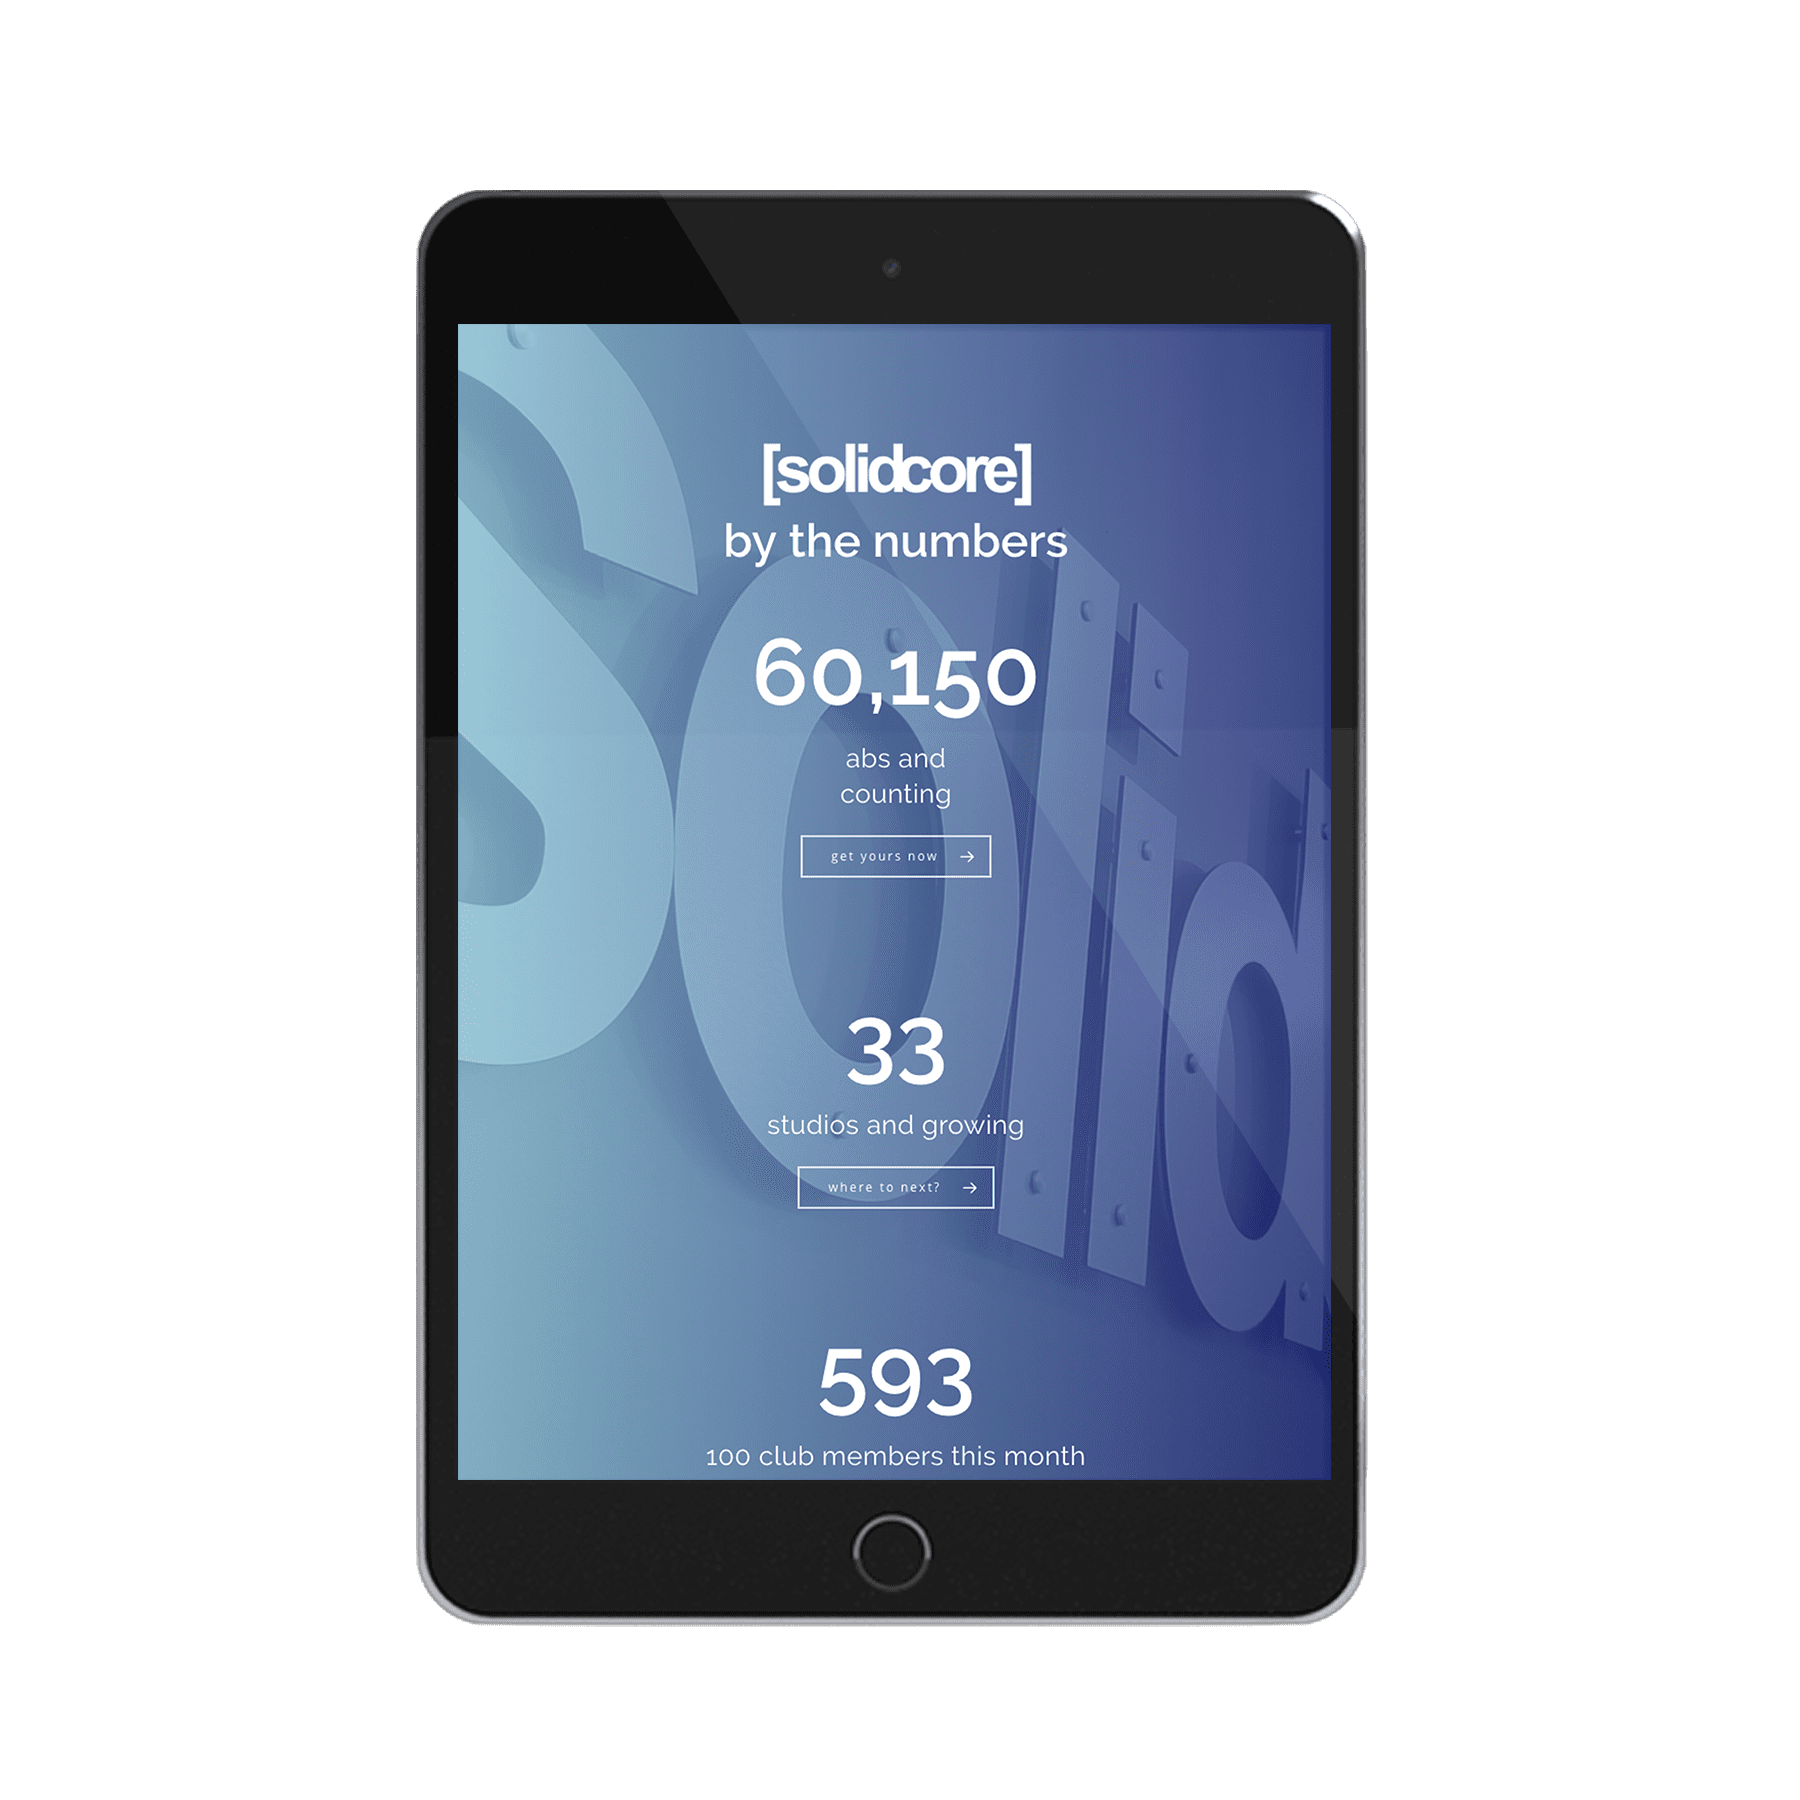 Solidcore Website Design